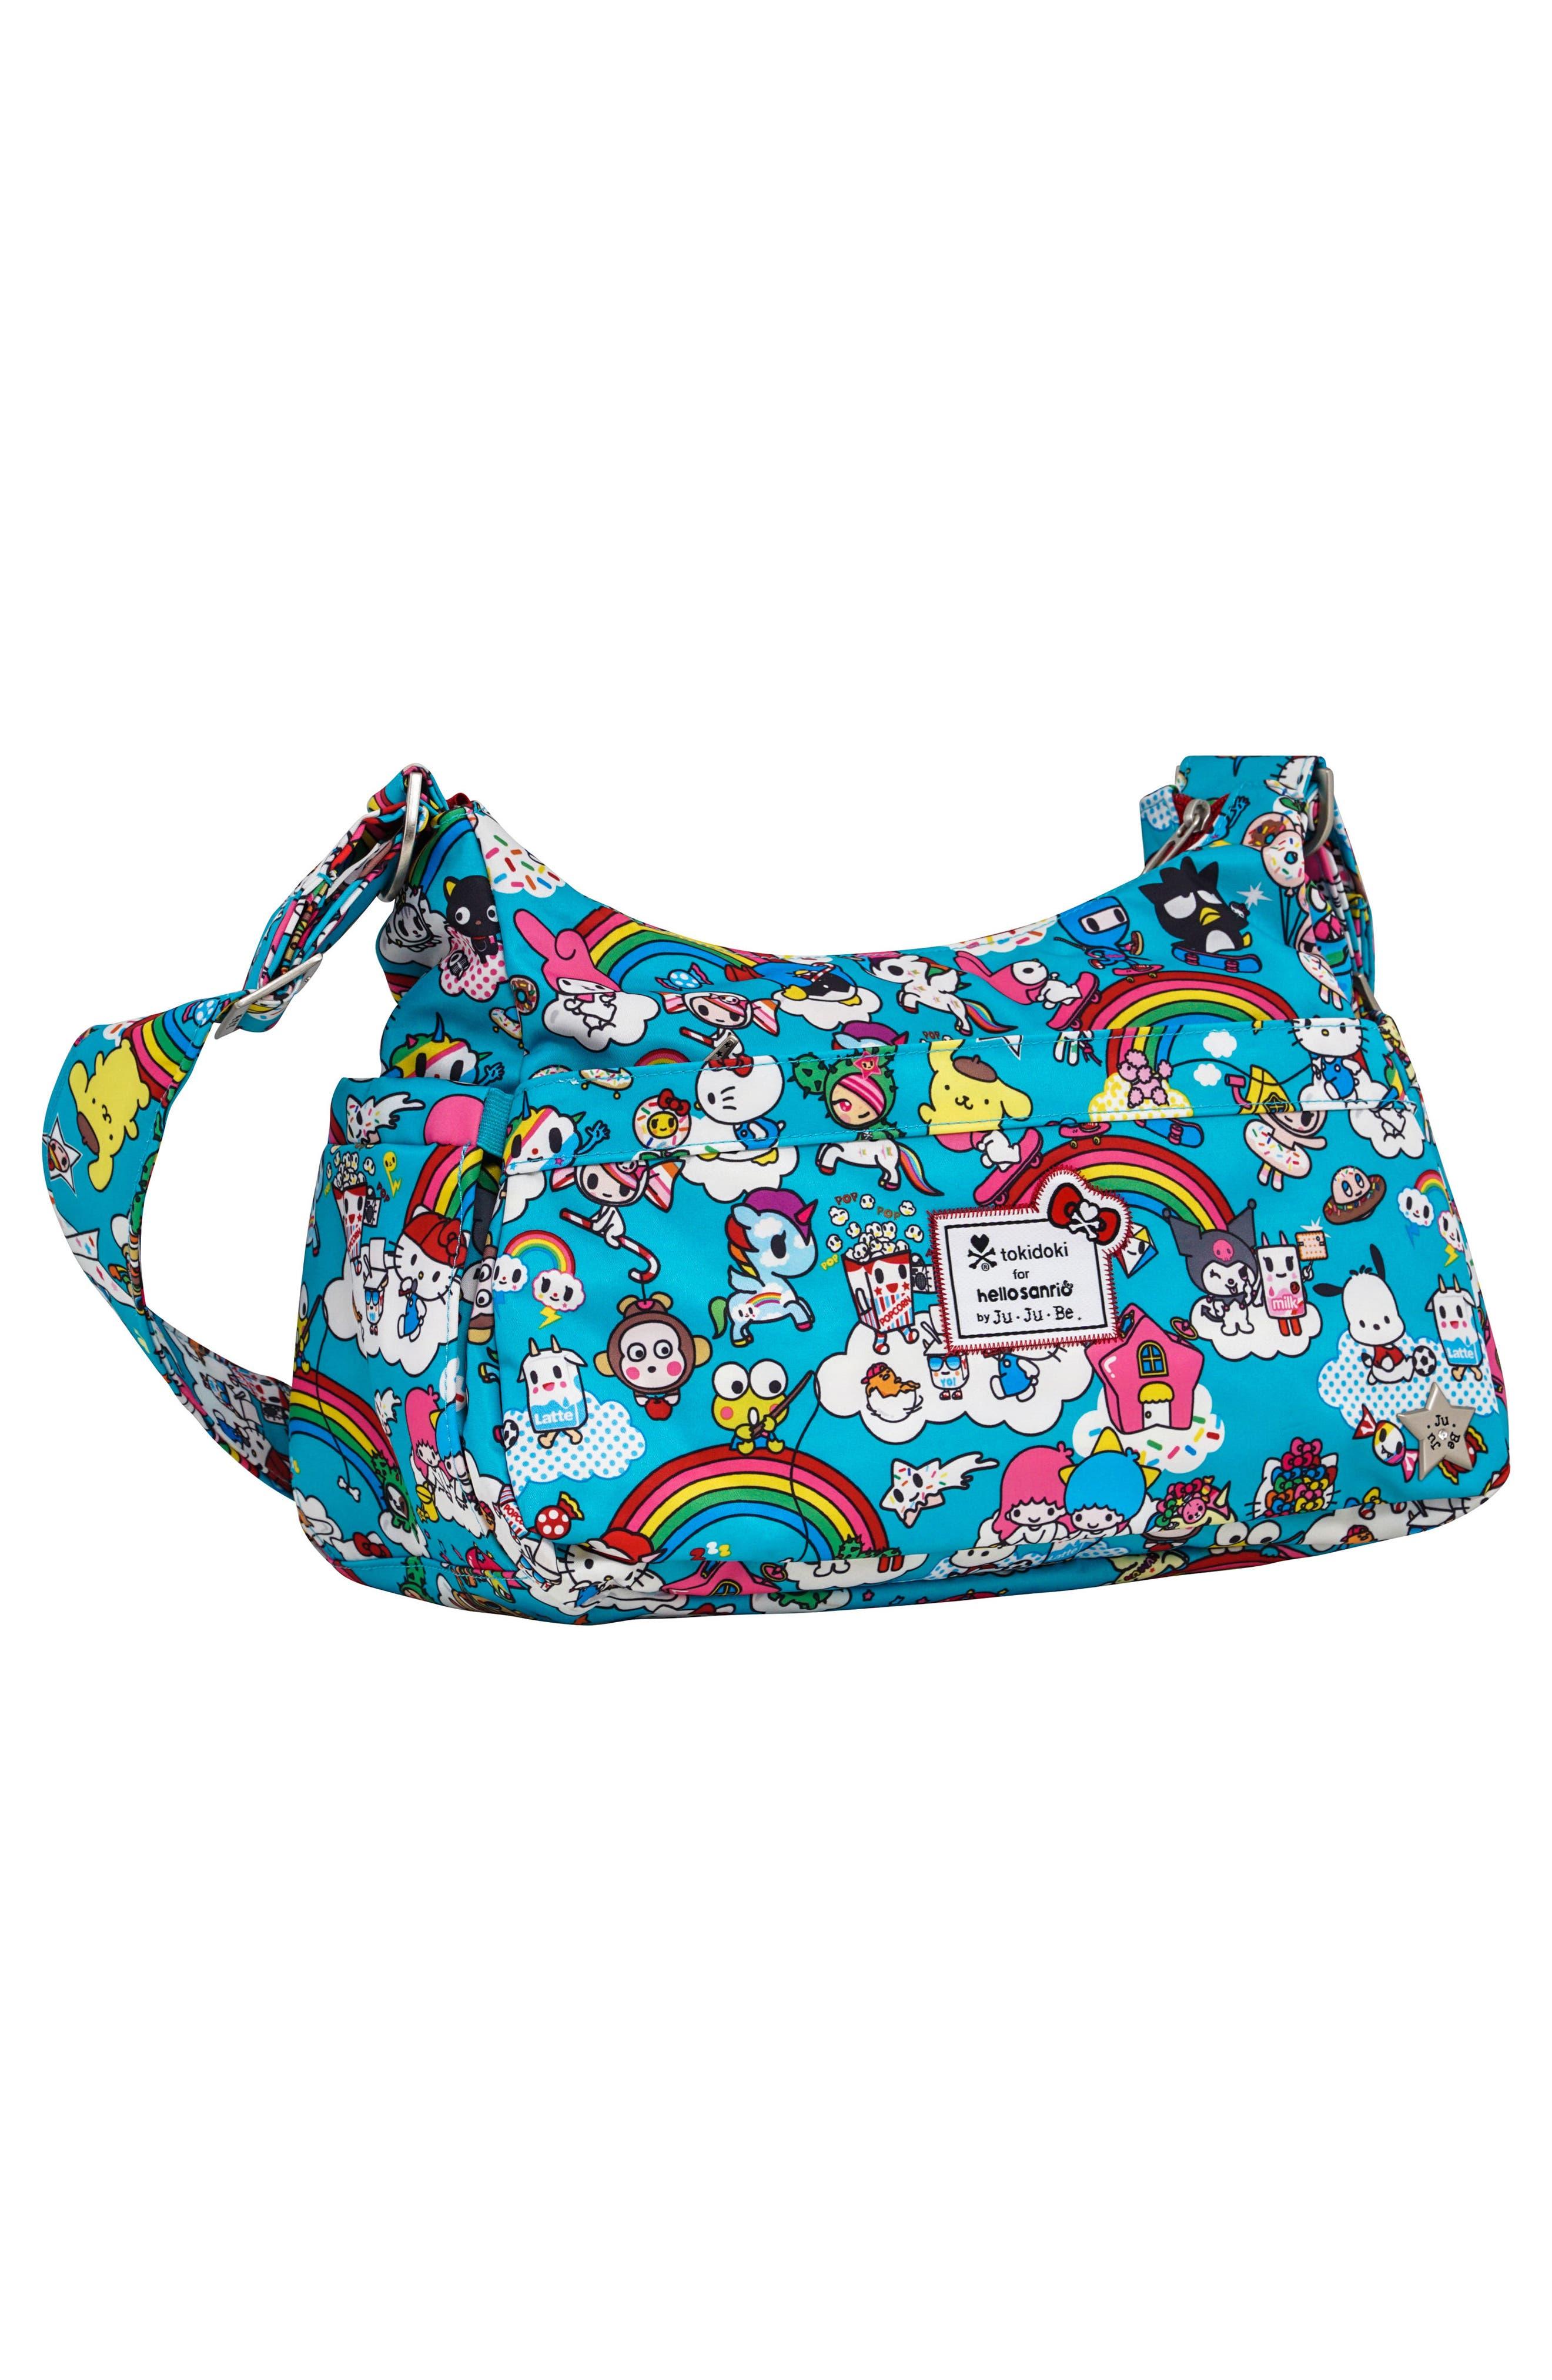 x tokidoki for Hello Sanrio Rainbow Dreams Be Hobo Diaper Bag,                             Alternate thumbnail 3, color,                             433